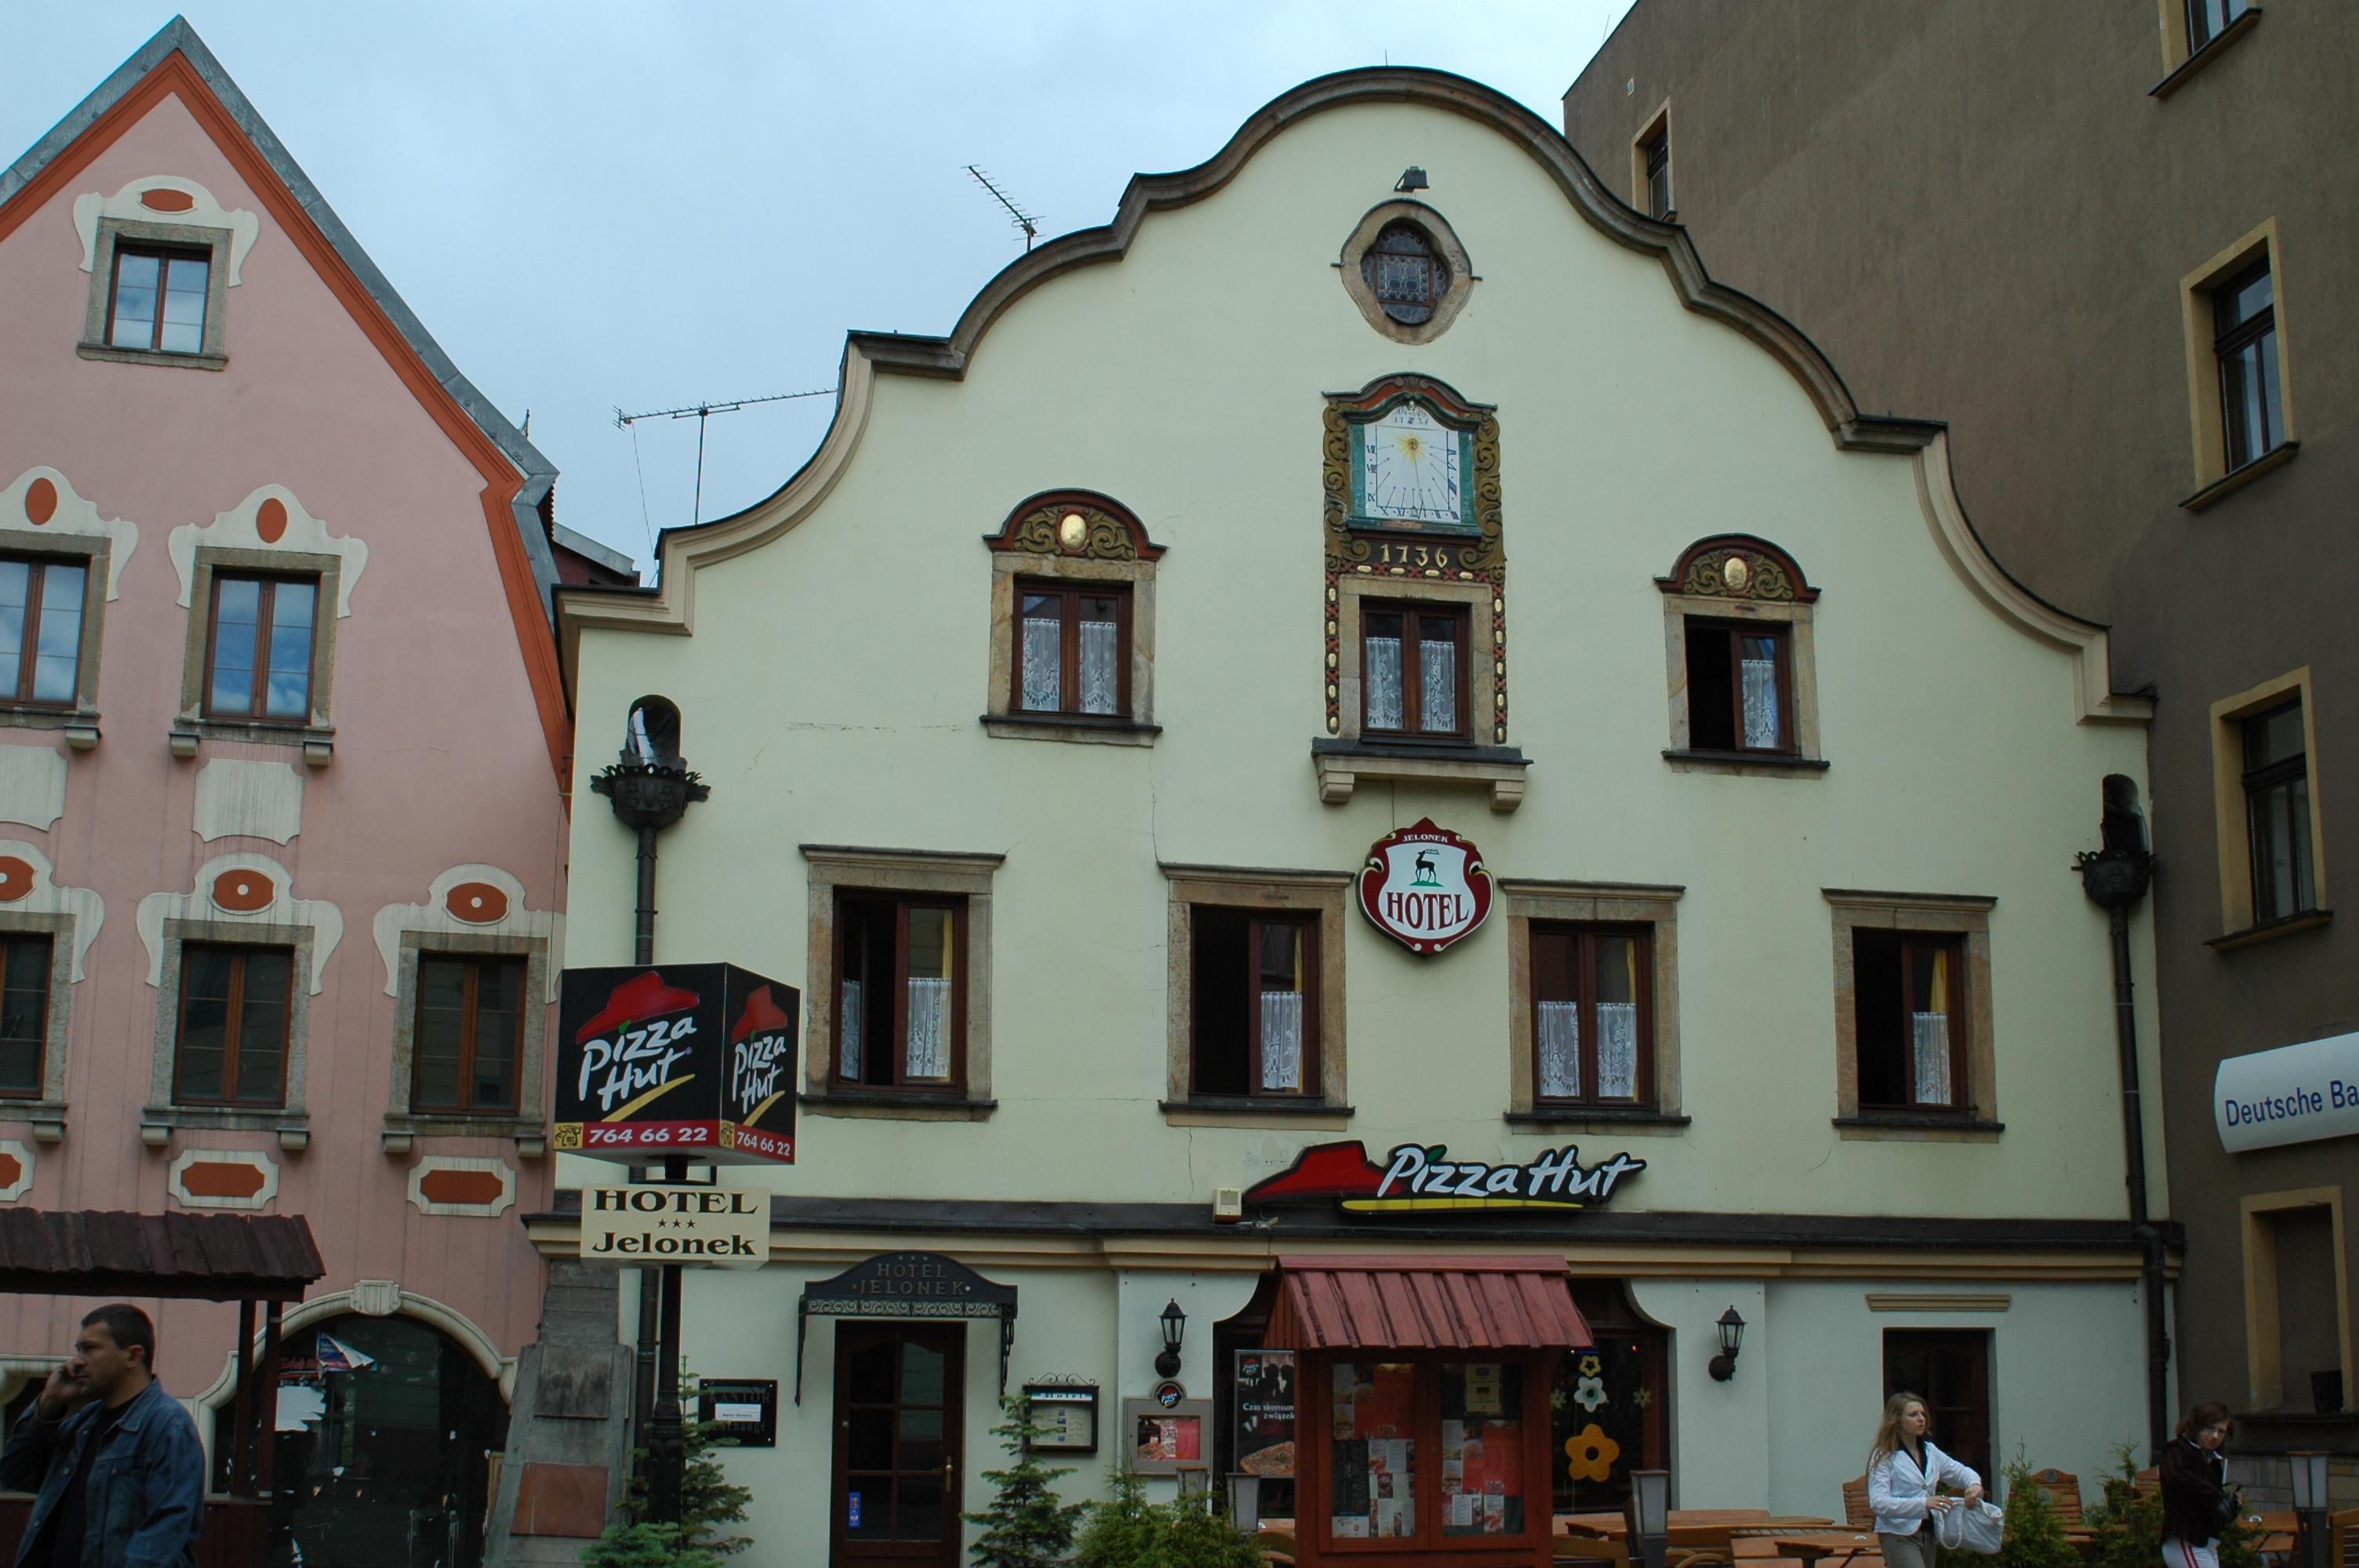 Jelenia Gora - Hotel Jelonek